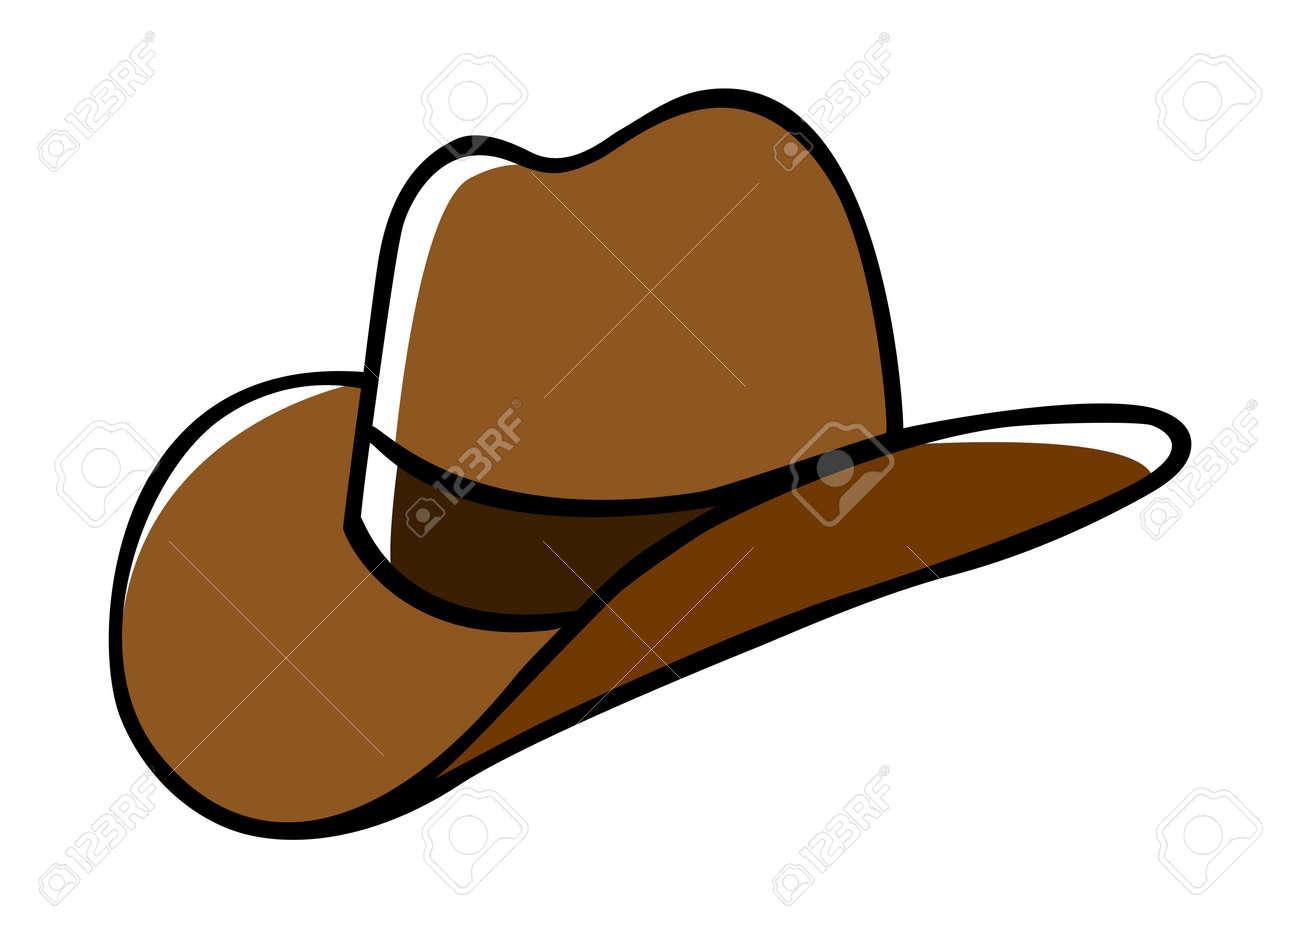 d96caedd2 Doodle illustration of a cowboy hat